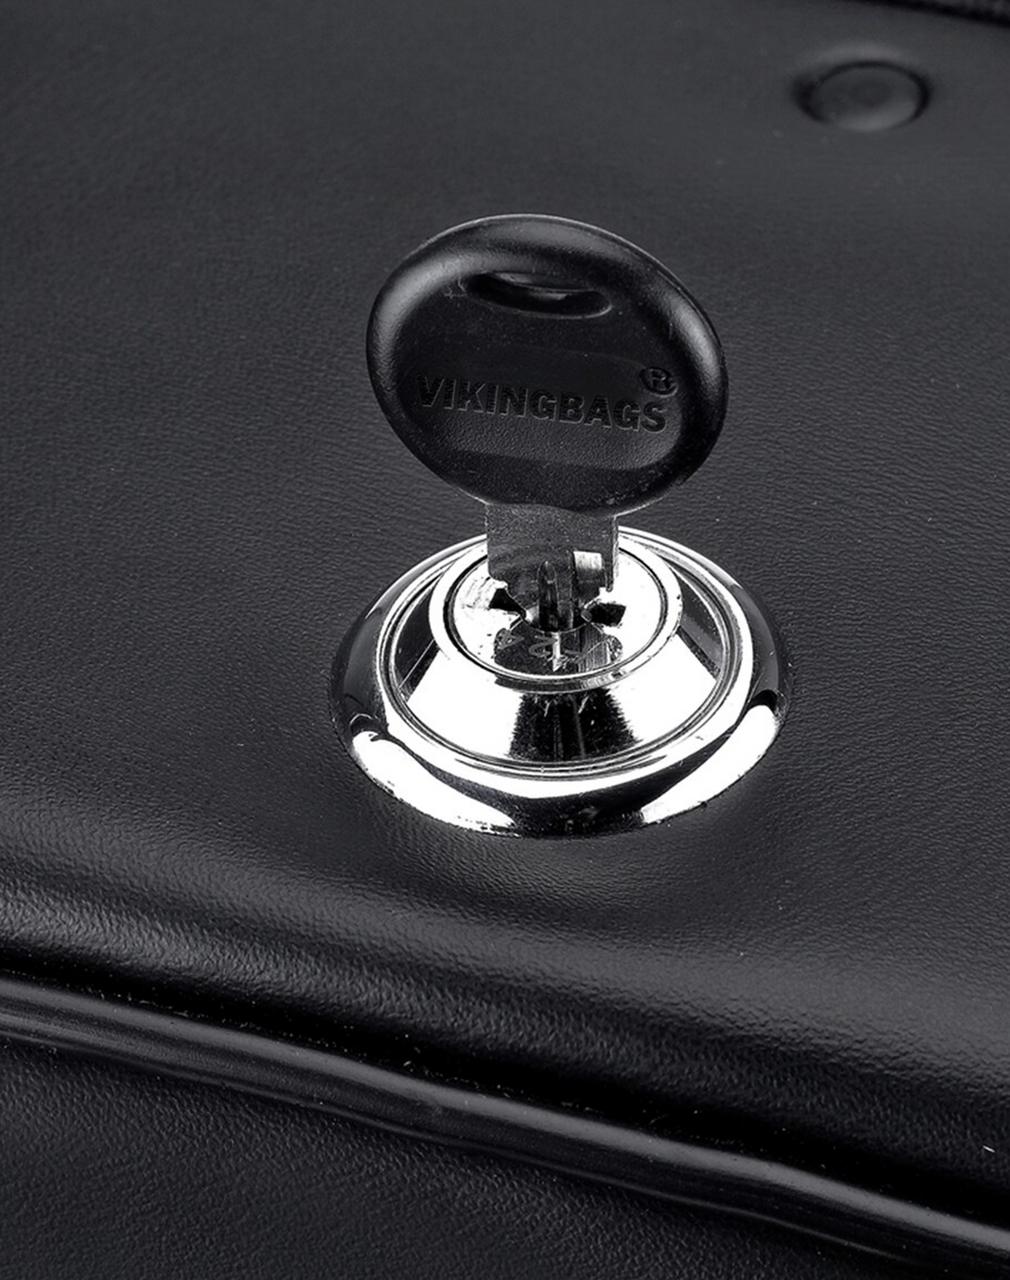 Honda 750 Shadow Phantom Large SS Shock Cutout Slanted Motorcycle Saddlebags lock key view